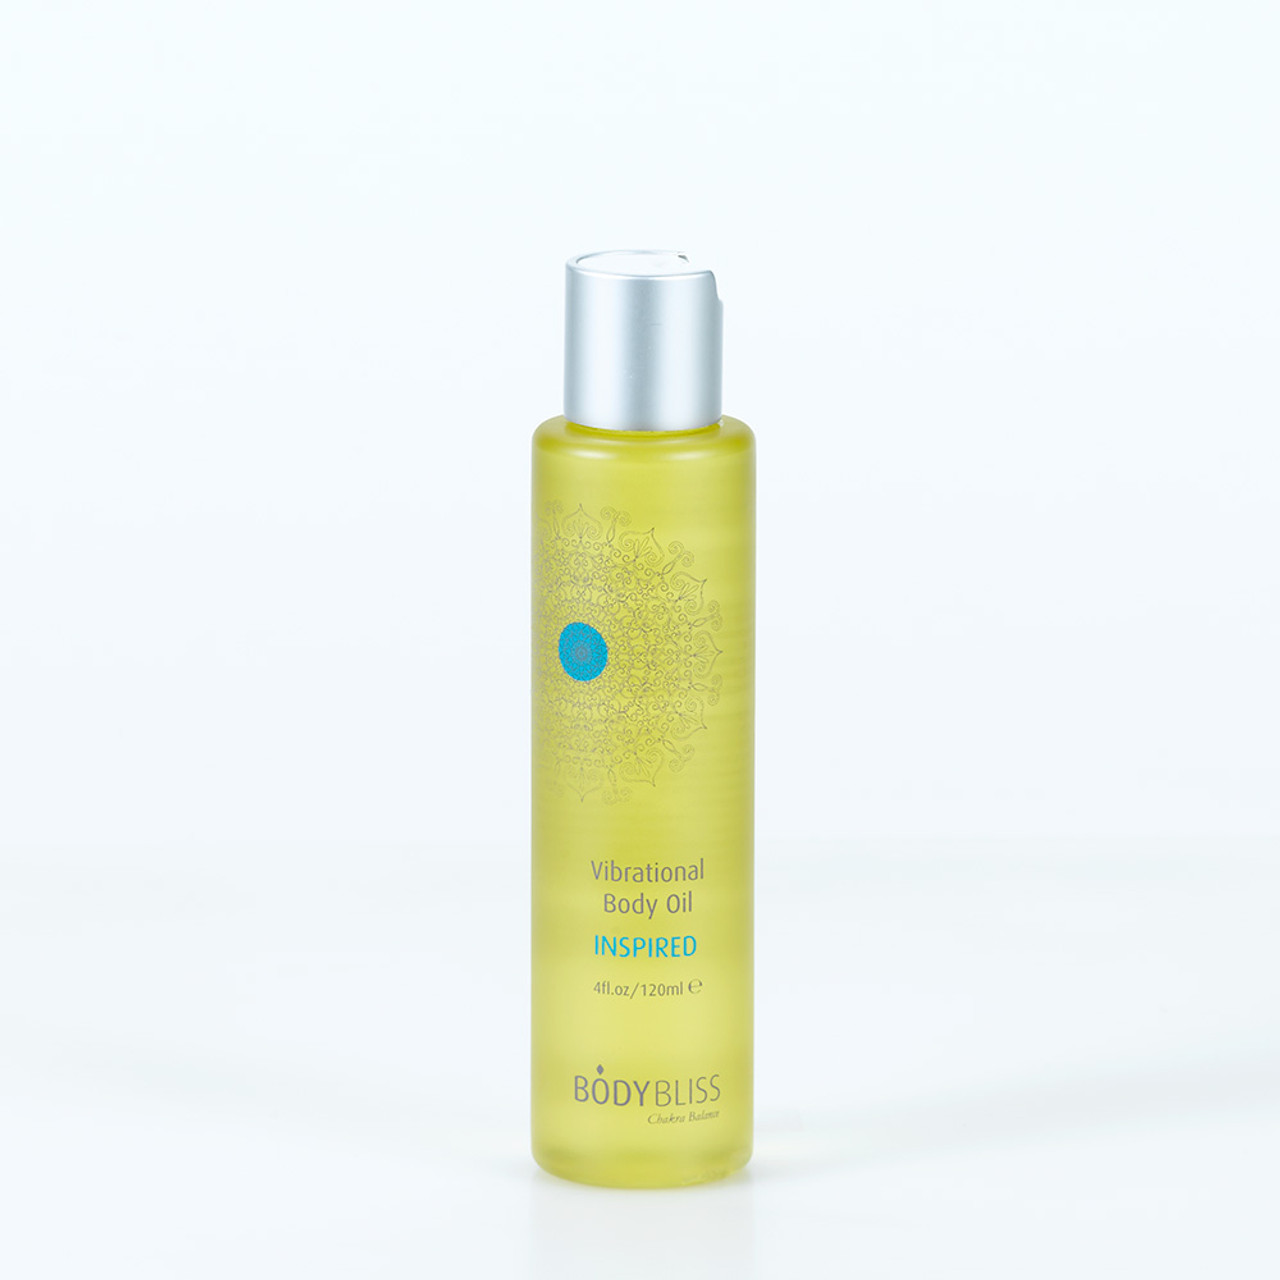 Vibrational Body Oil